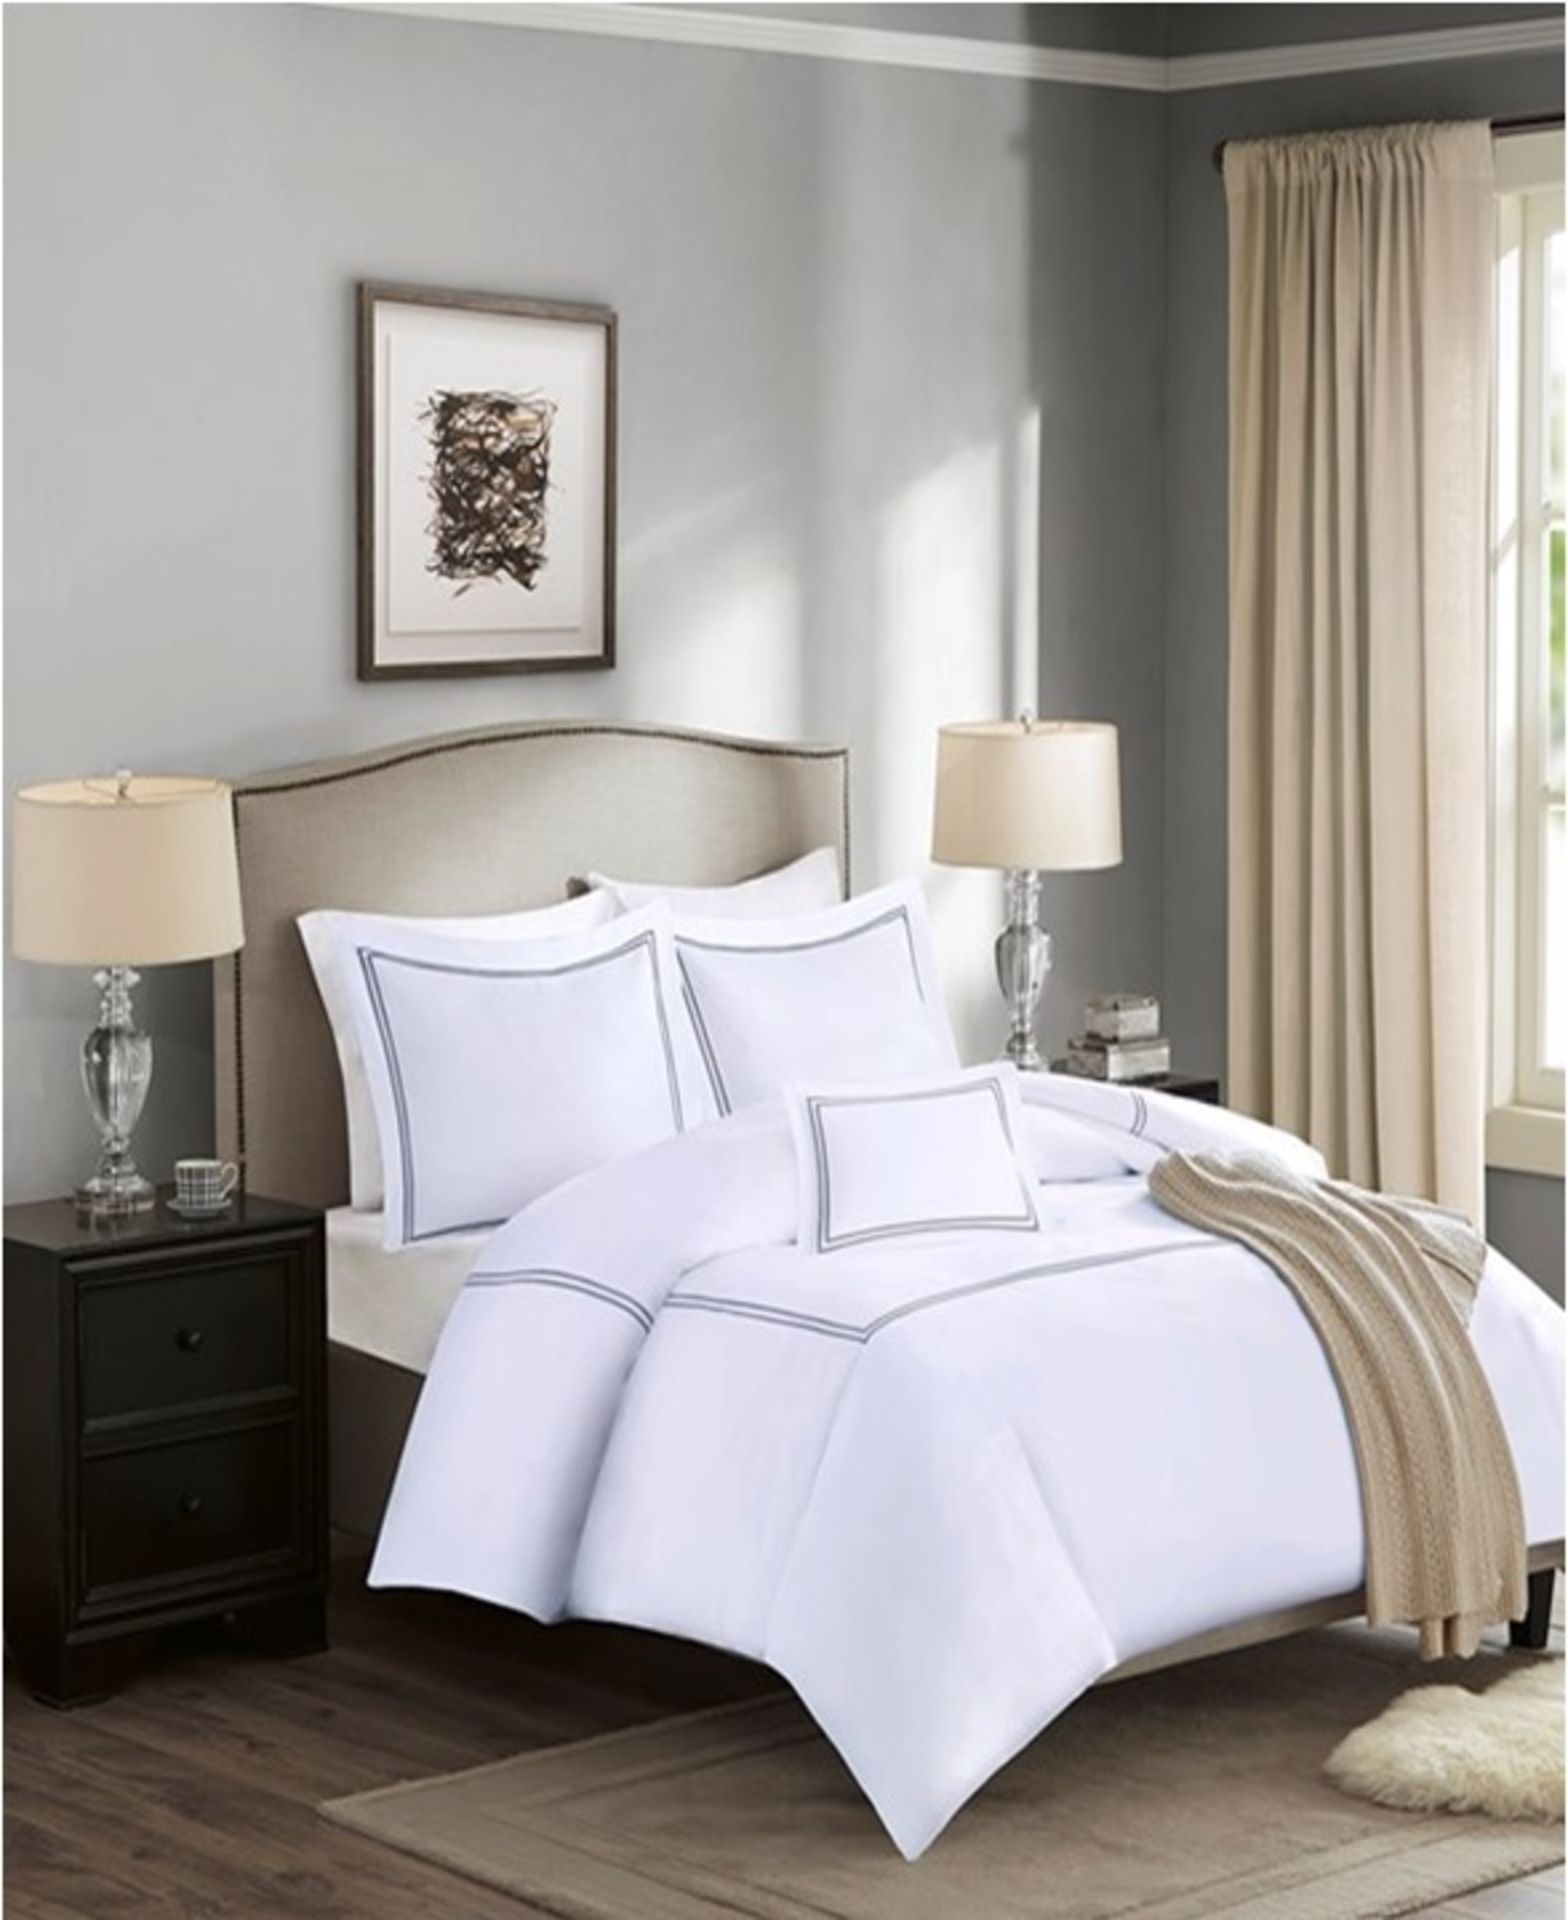 Lot 144 - 1 x Madison Park Luxury Collection Single Duvet Set White - Product Code MP12-0197UK (Brand New -